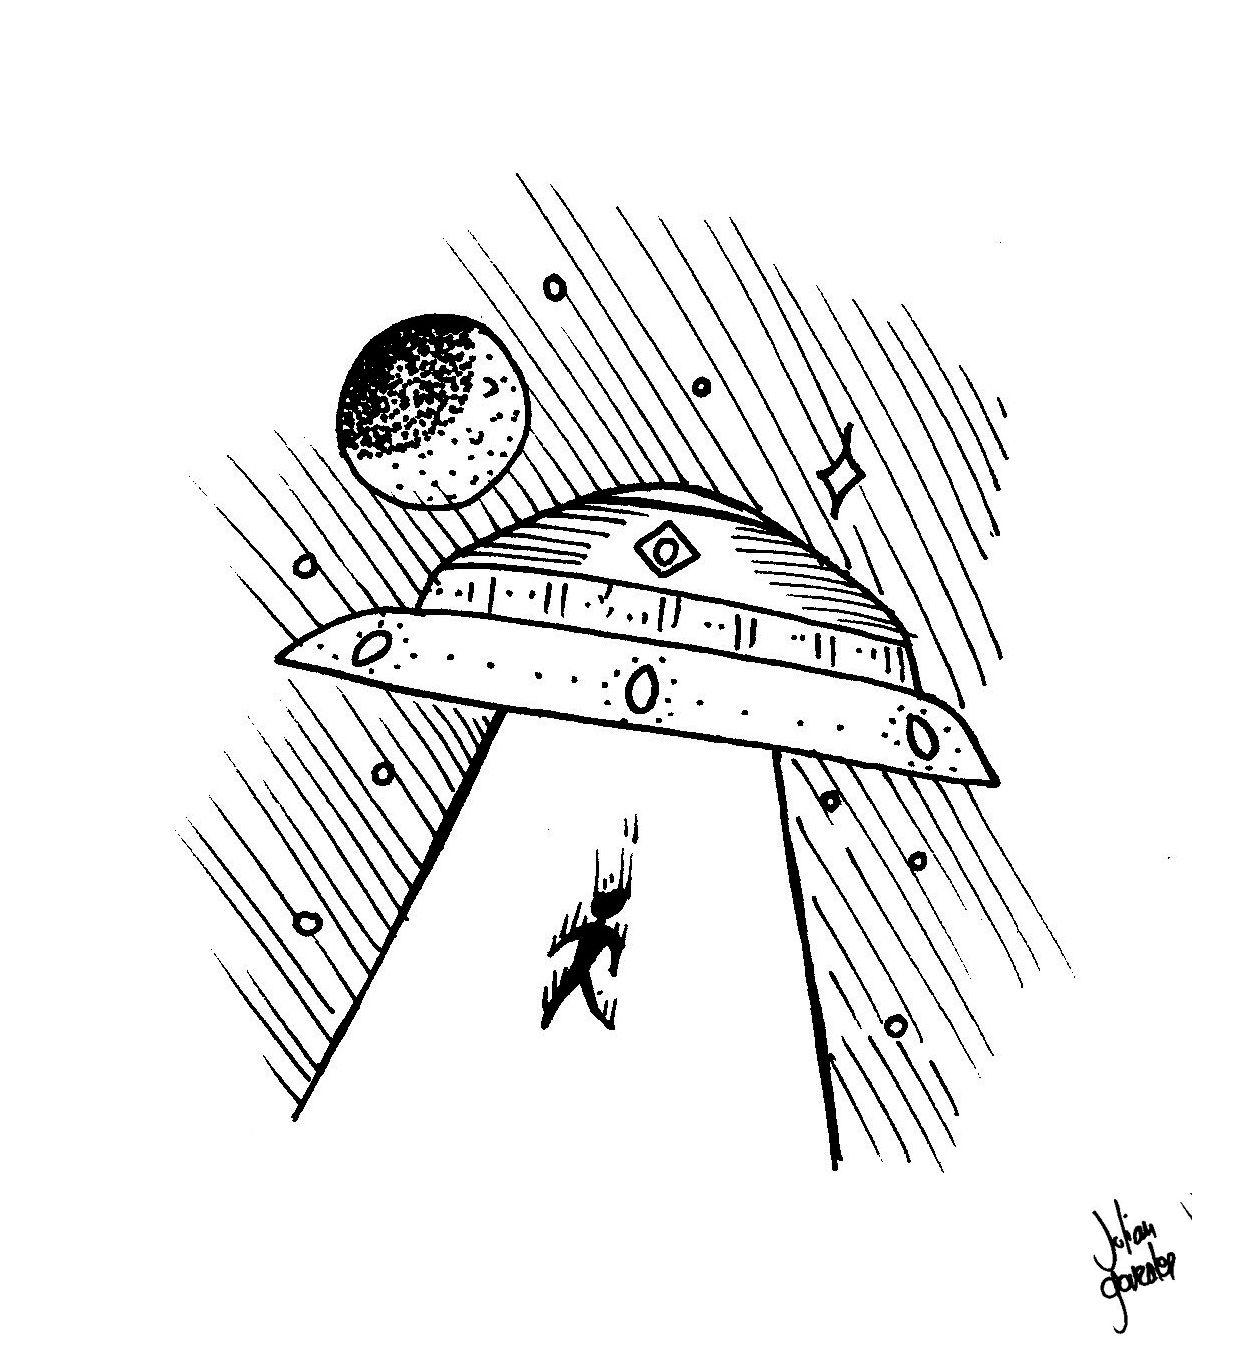 abducción. dibujo. Ovni. abduction drawing U.F.O. | Dibujos ...